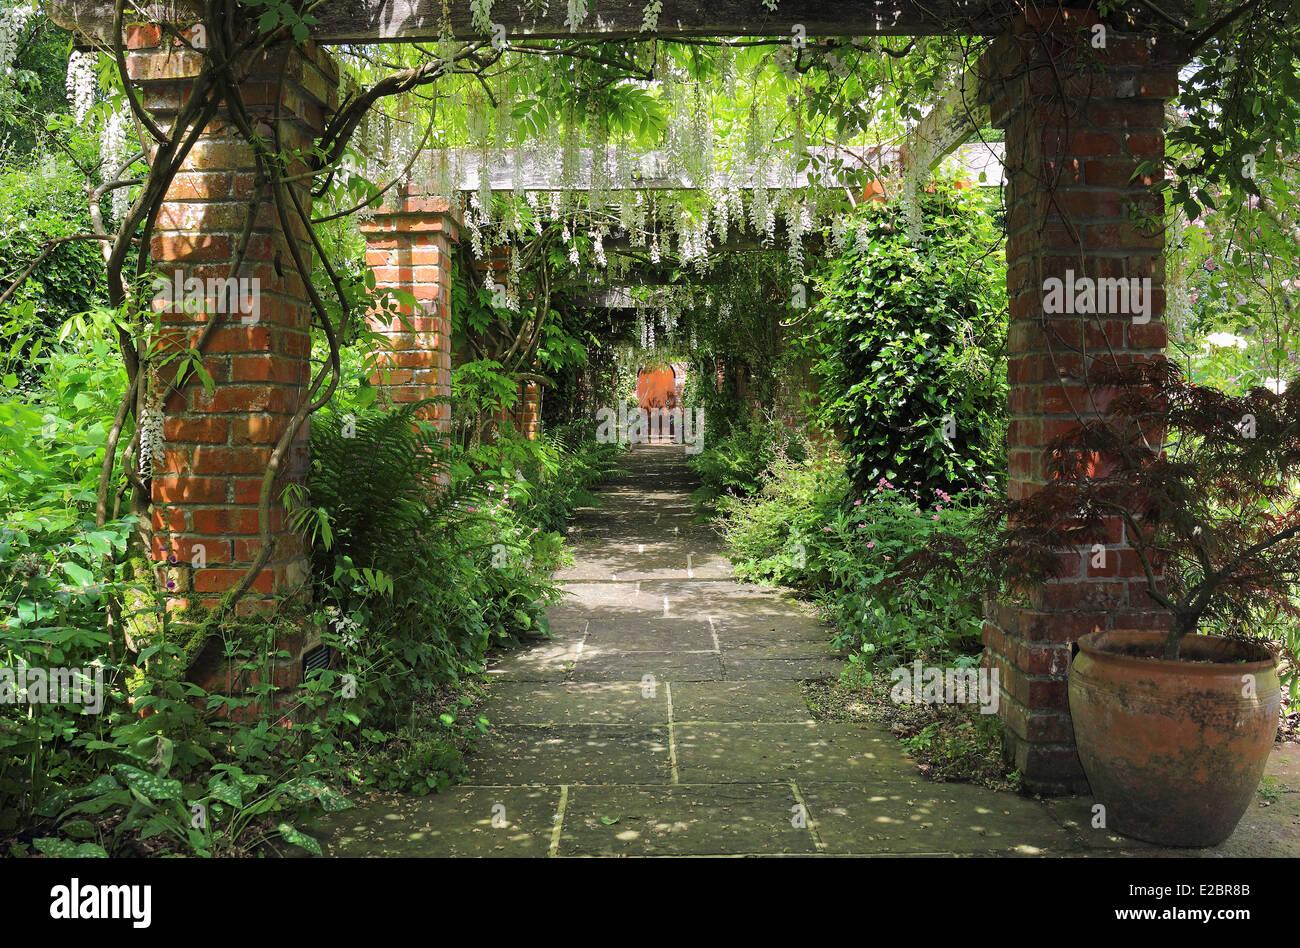 A Pergola Covered In Wisteria In An English Garden